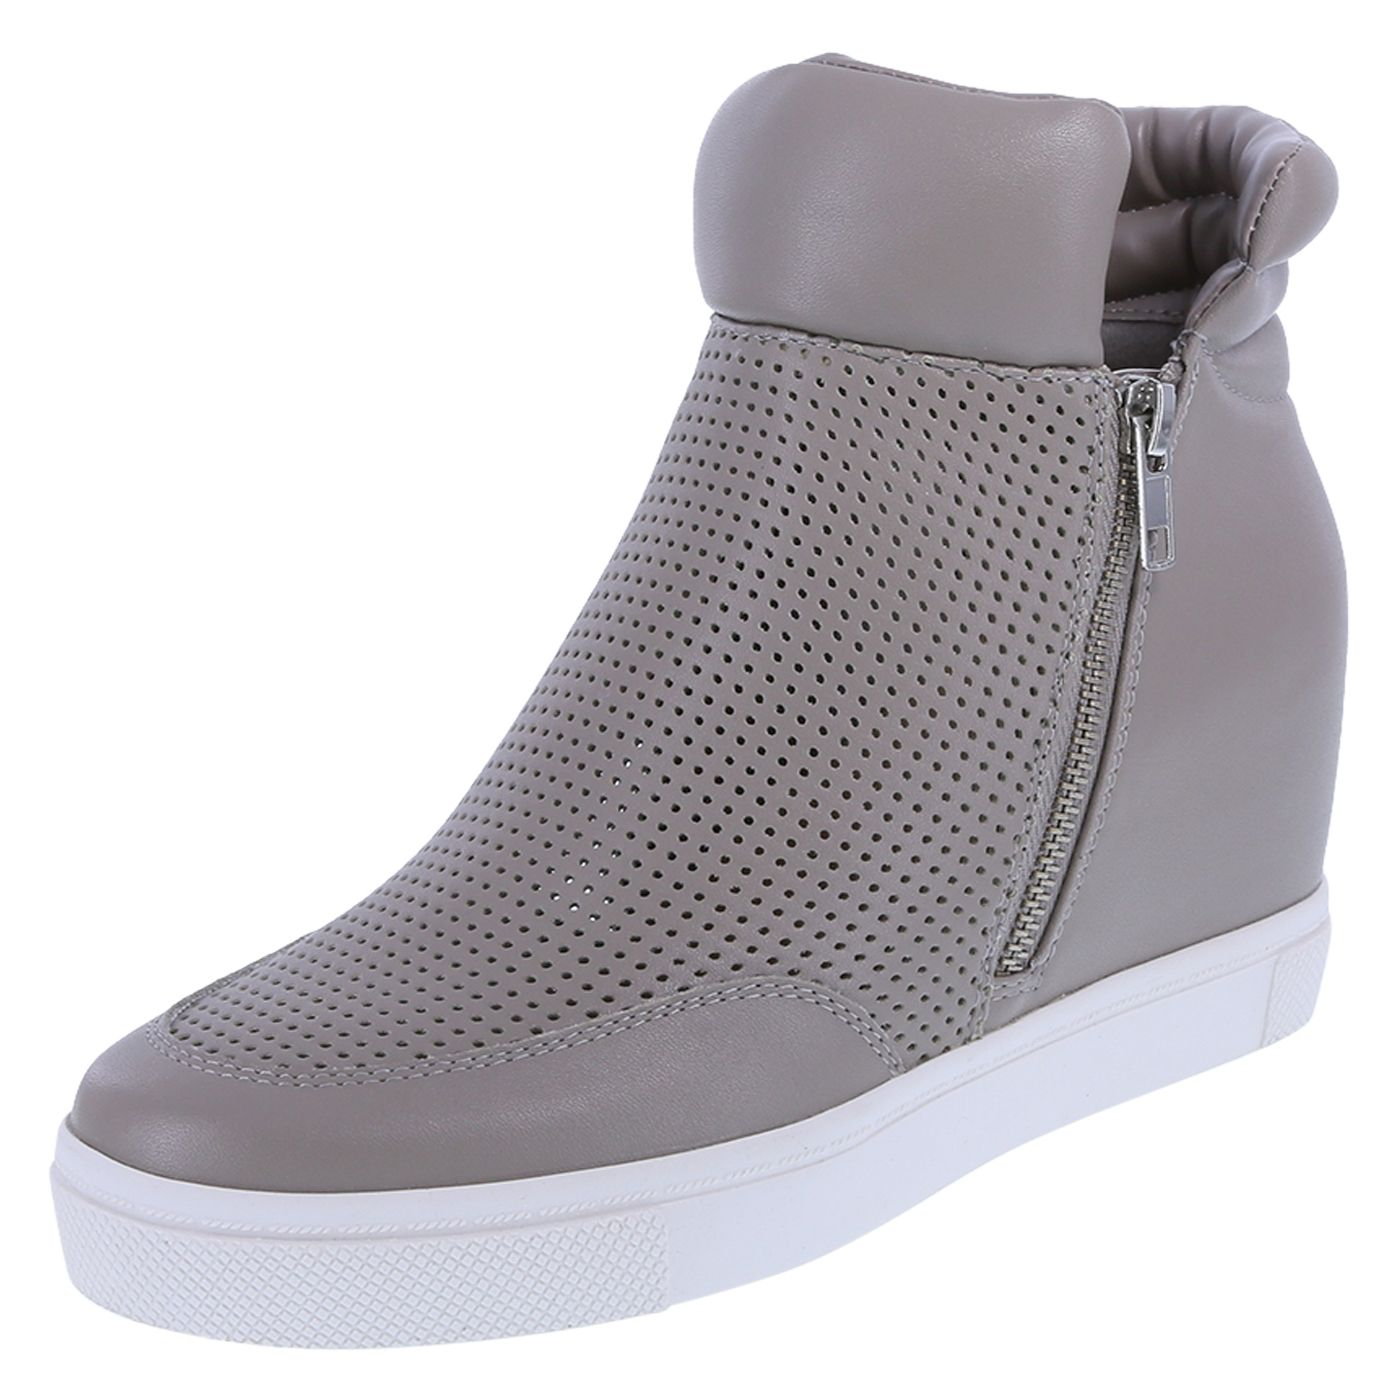 90c23957fc3e Women s Divina Hidden Wedge SneakerWomen s Divina Hidden Wedge Sneaker